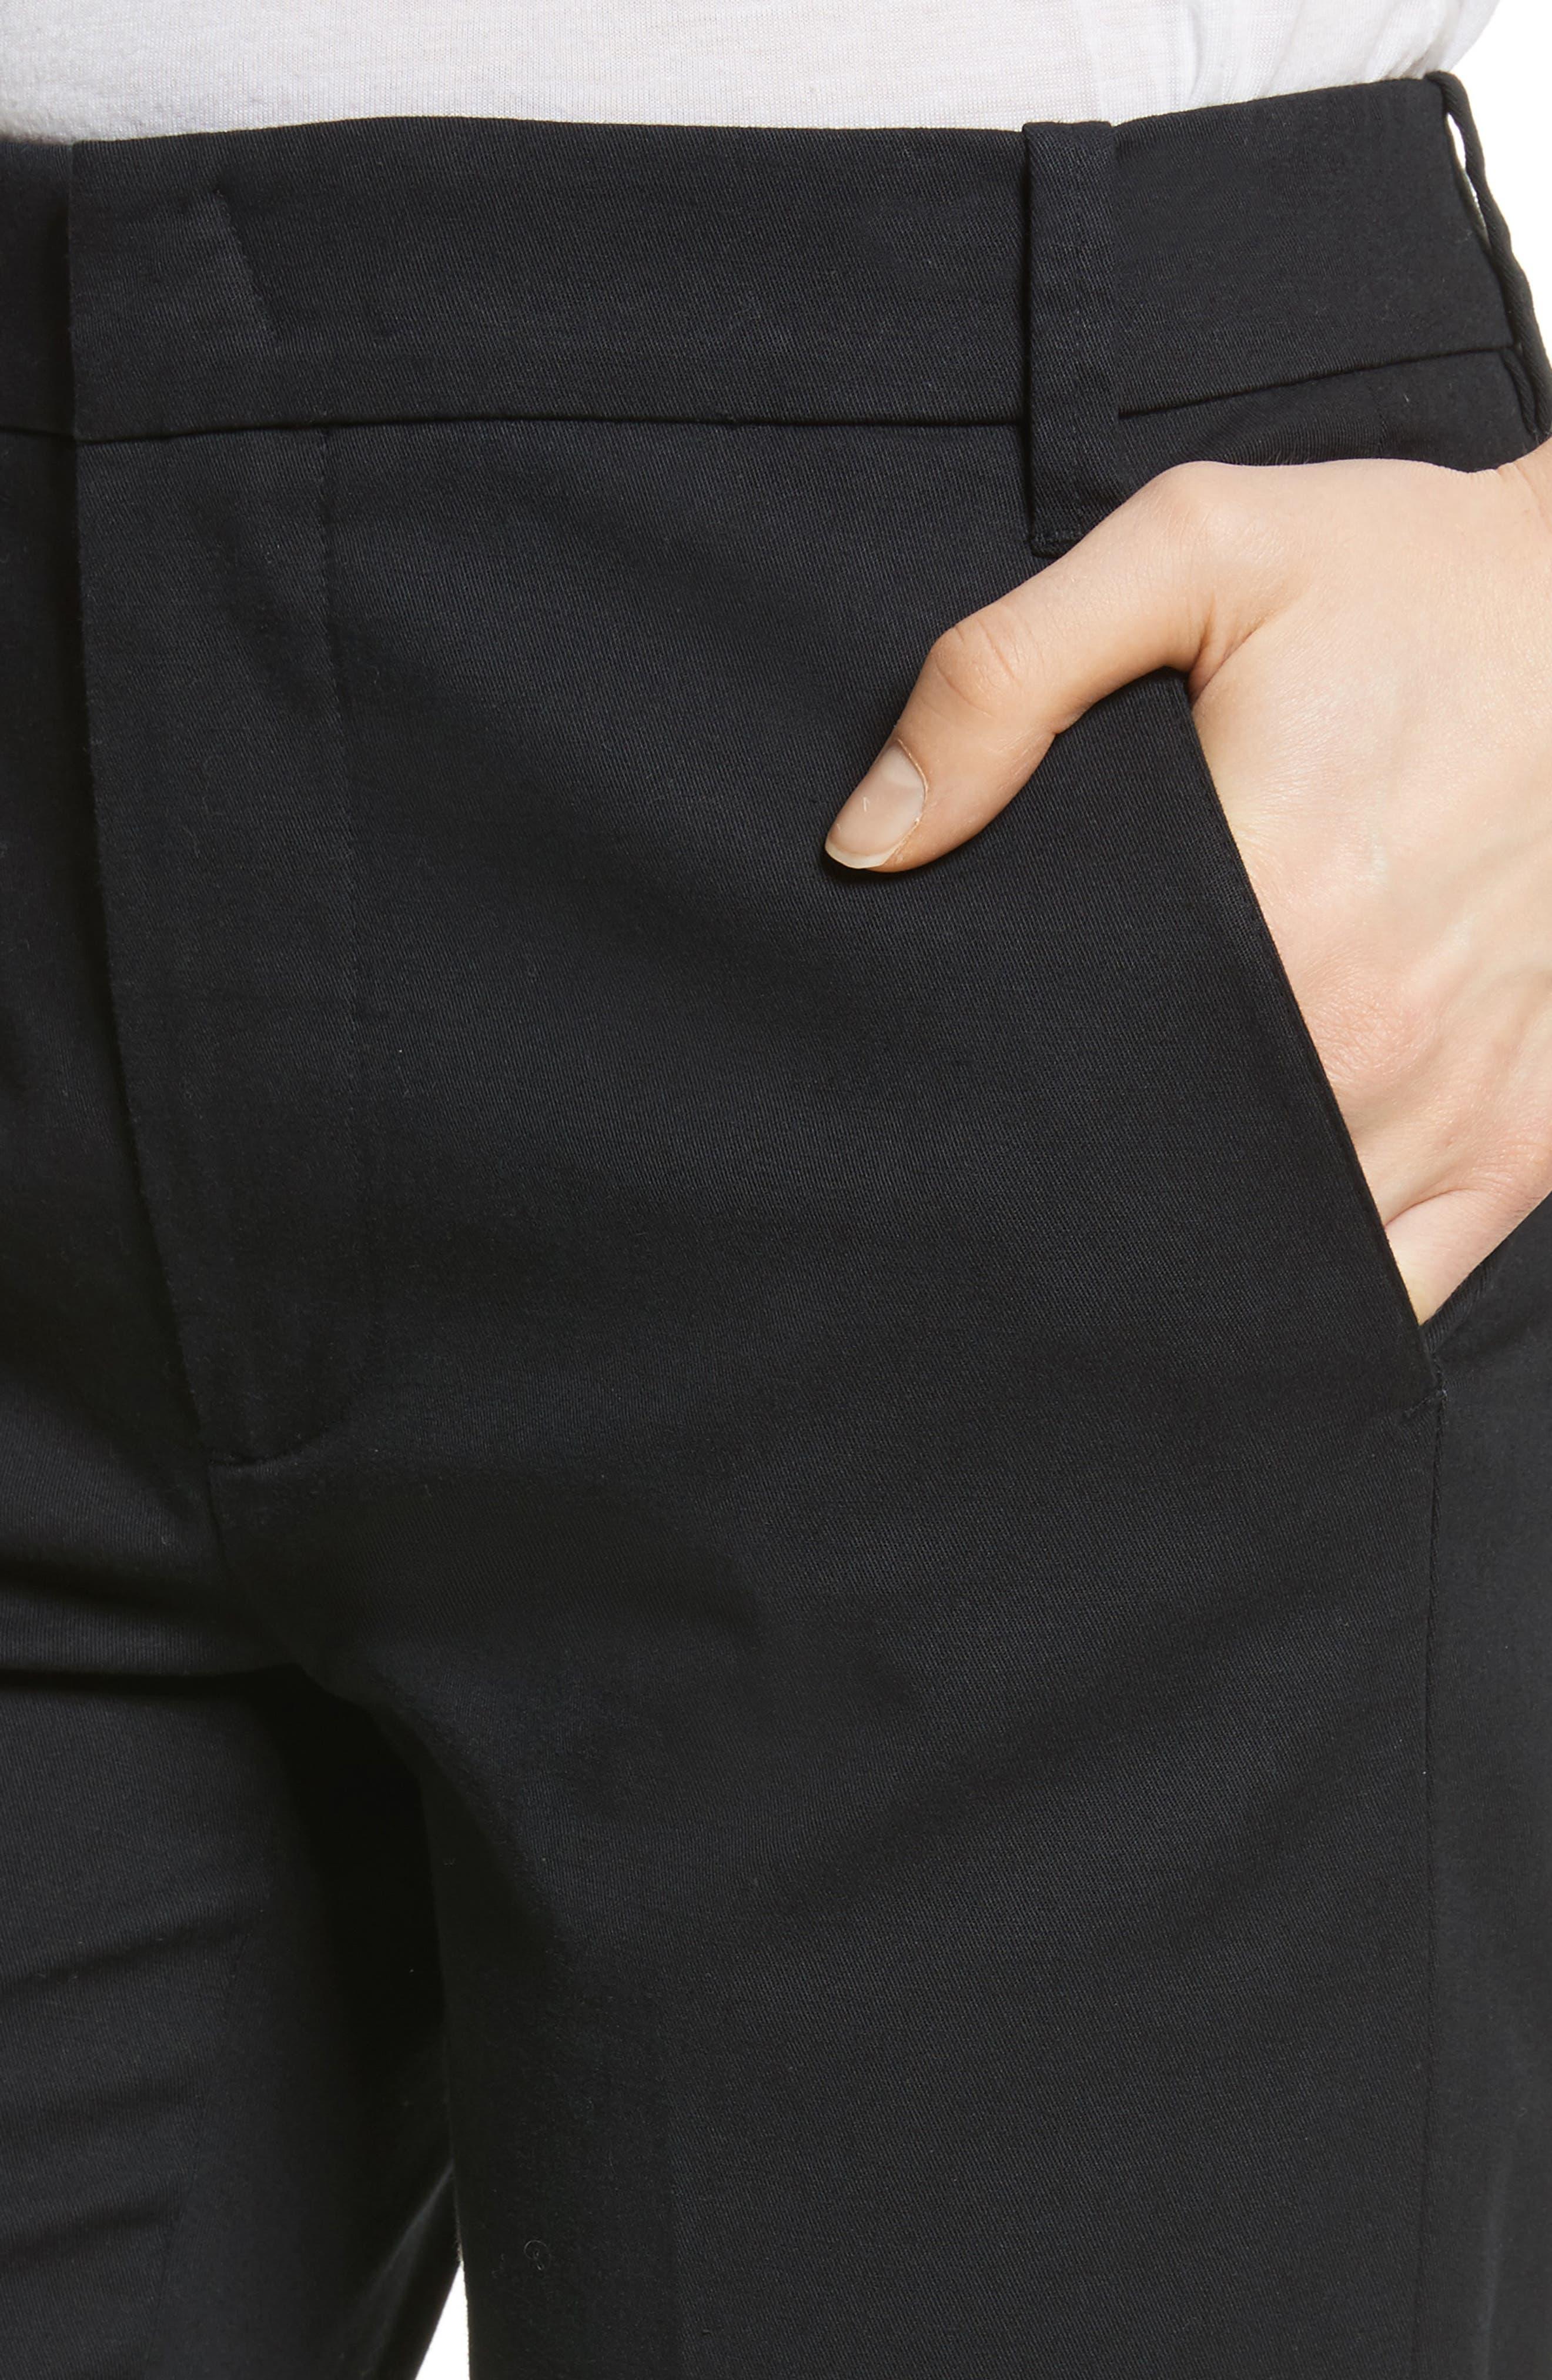 VINCE, Coin Pocket Chino Pants, Alternate thumbnail 5, color, BLACK